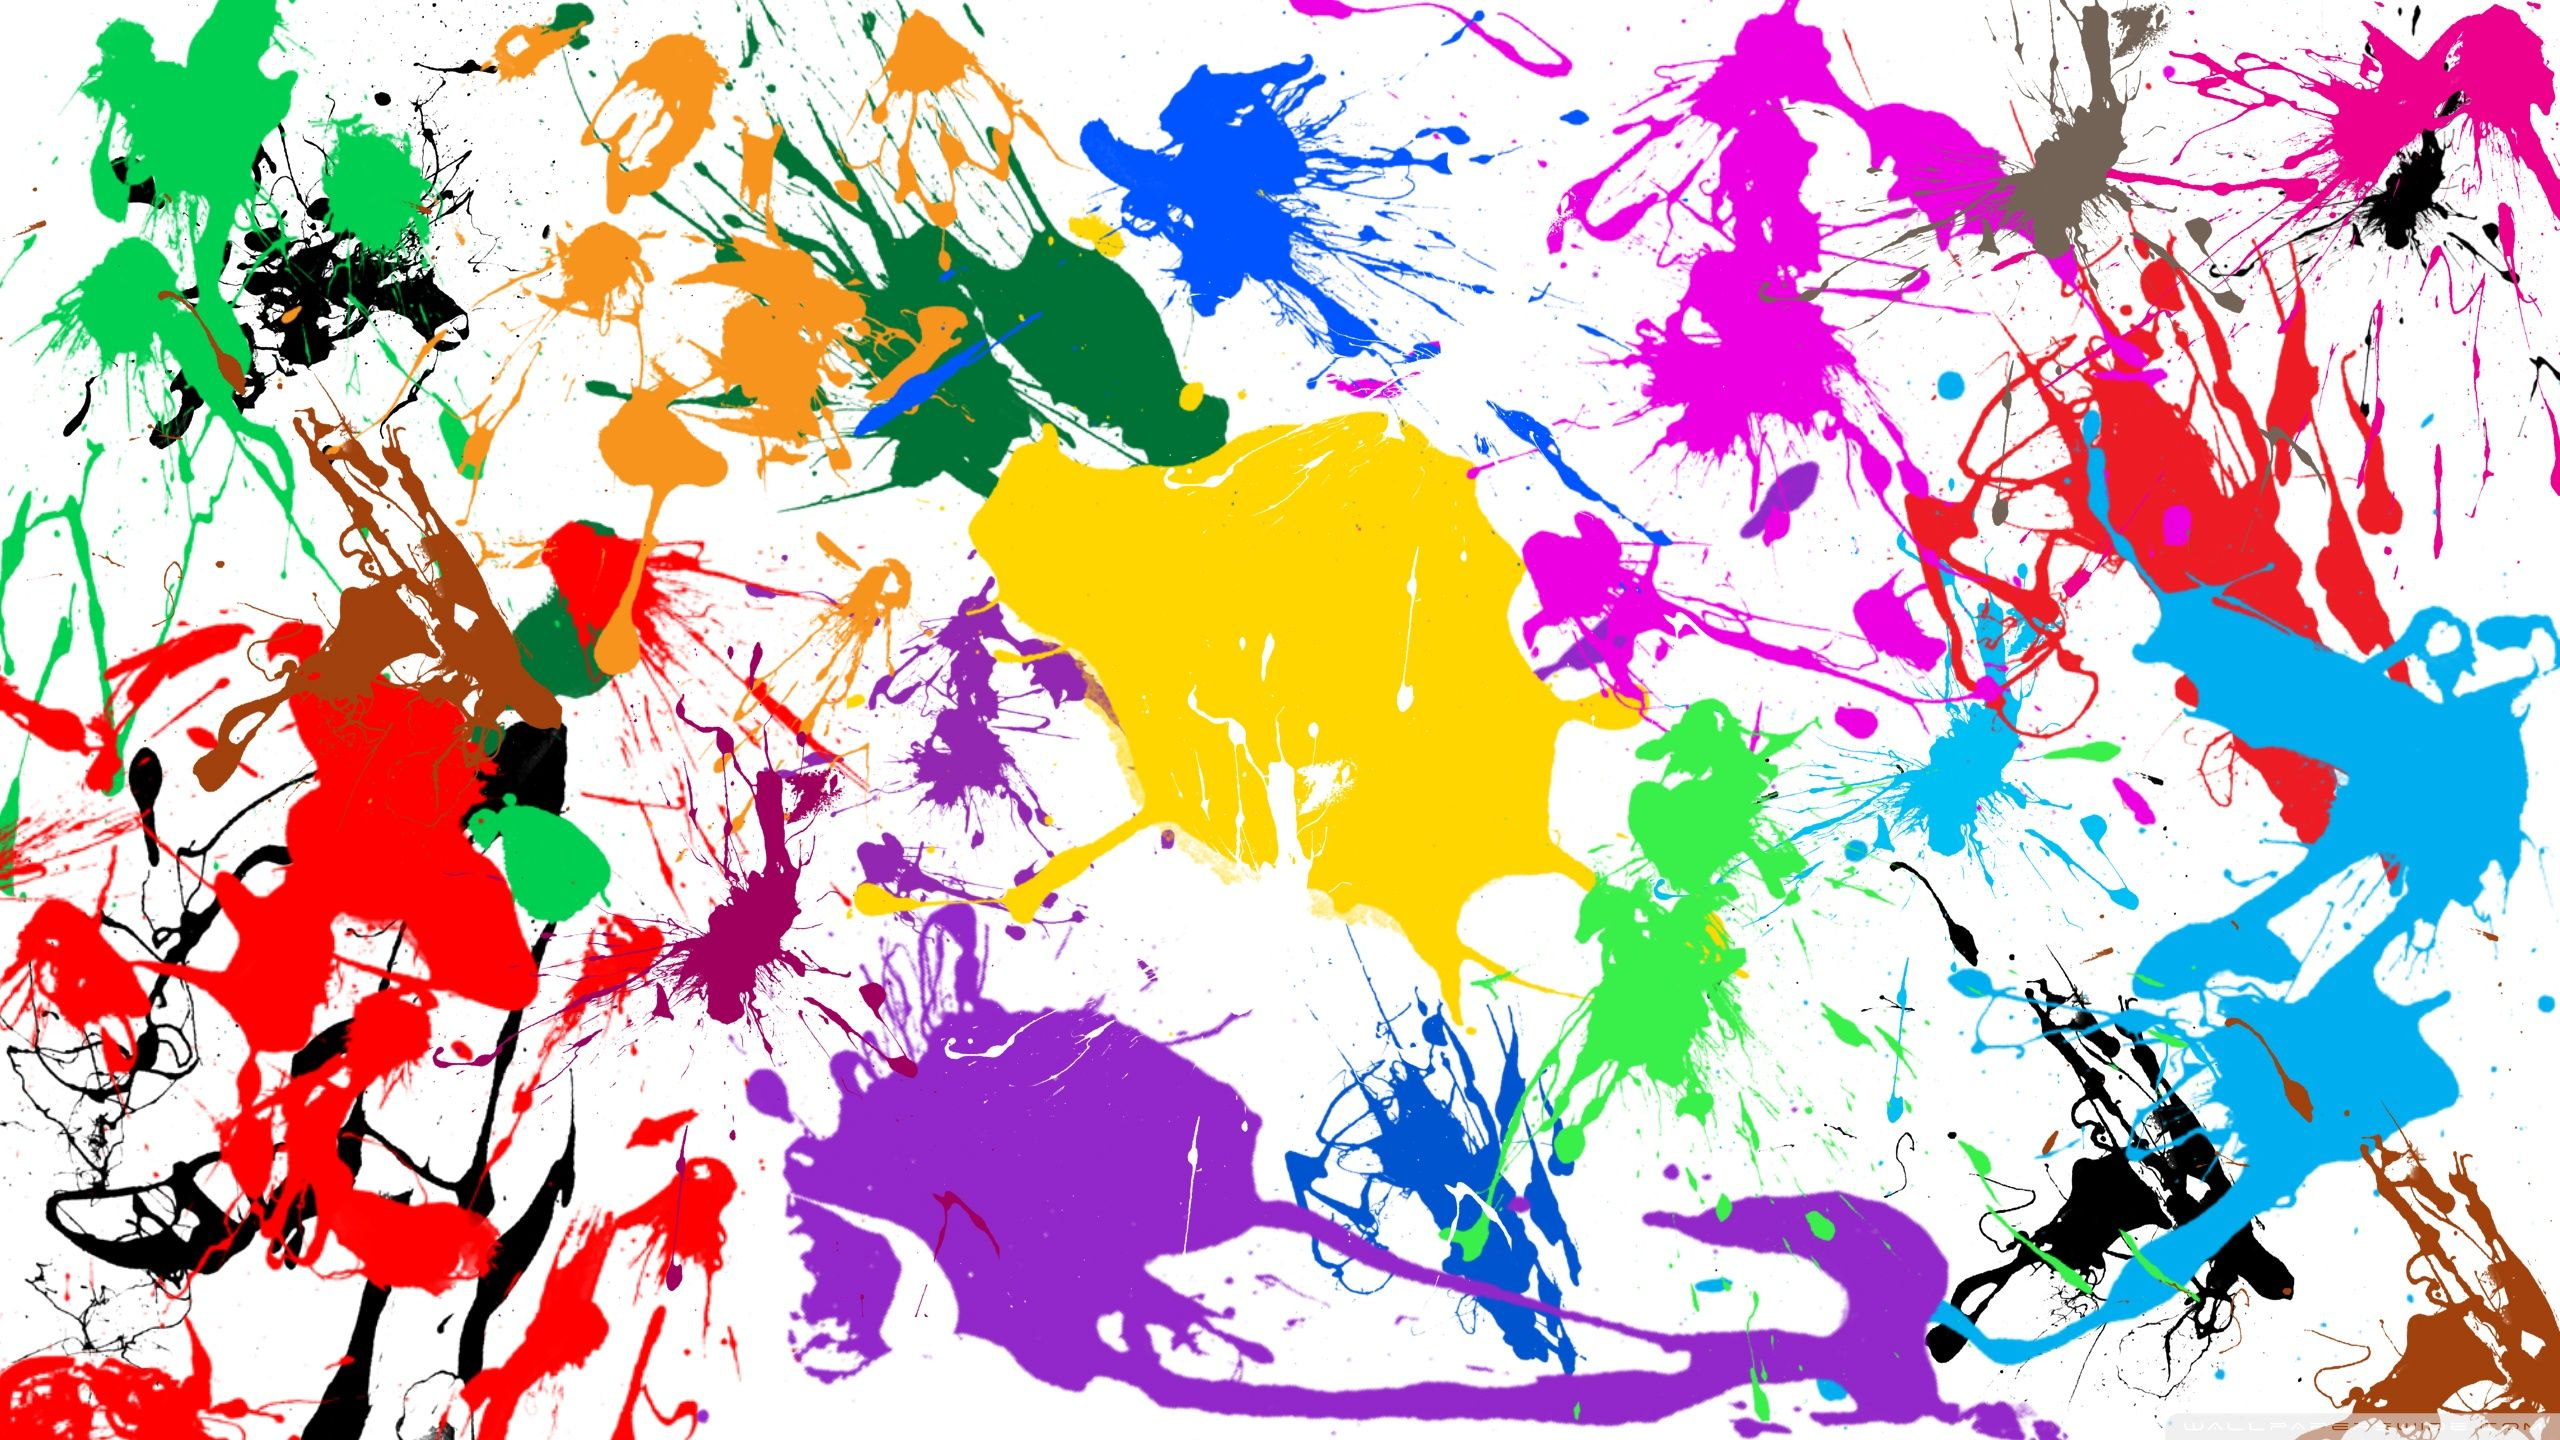 Abstract Paint Splatter Wallpaper Painting Painting Wallpaper Mural Painting